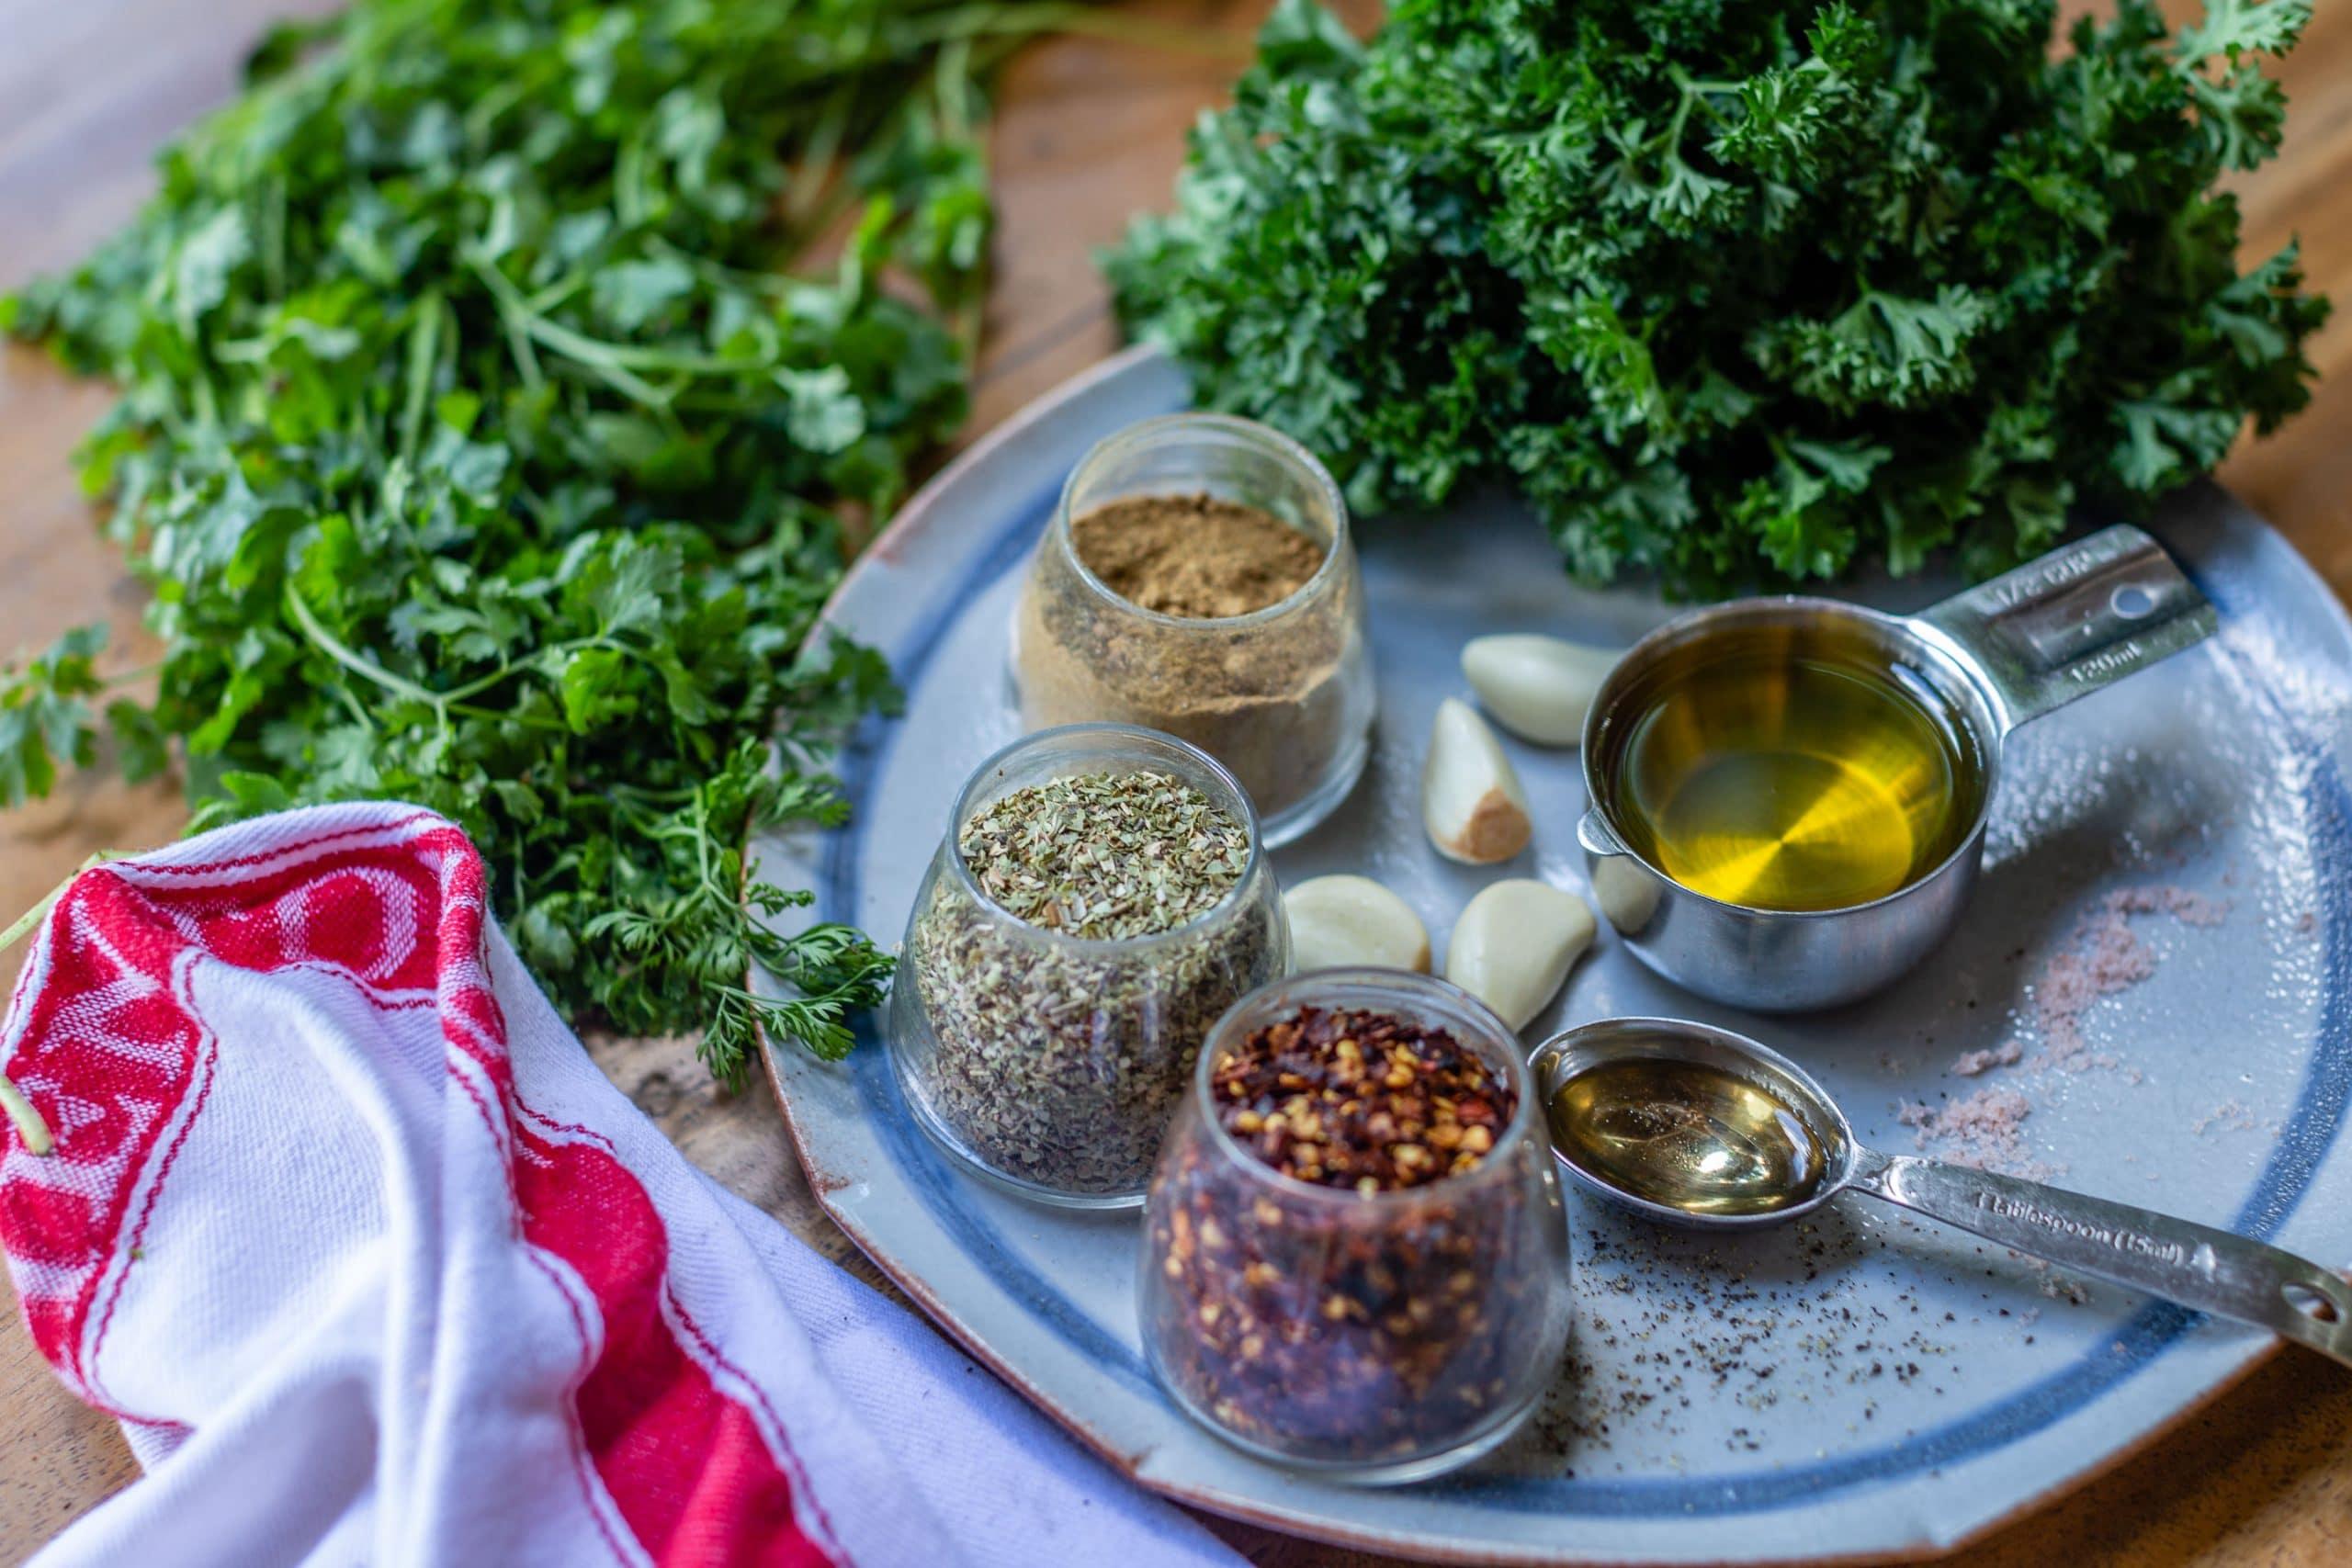 Chimichurri Sauce with Cilantro Ingredients